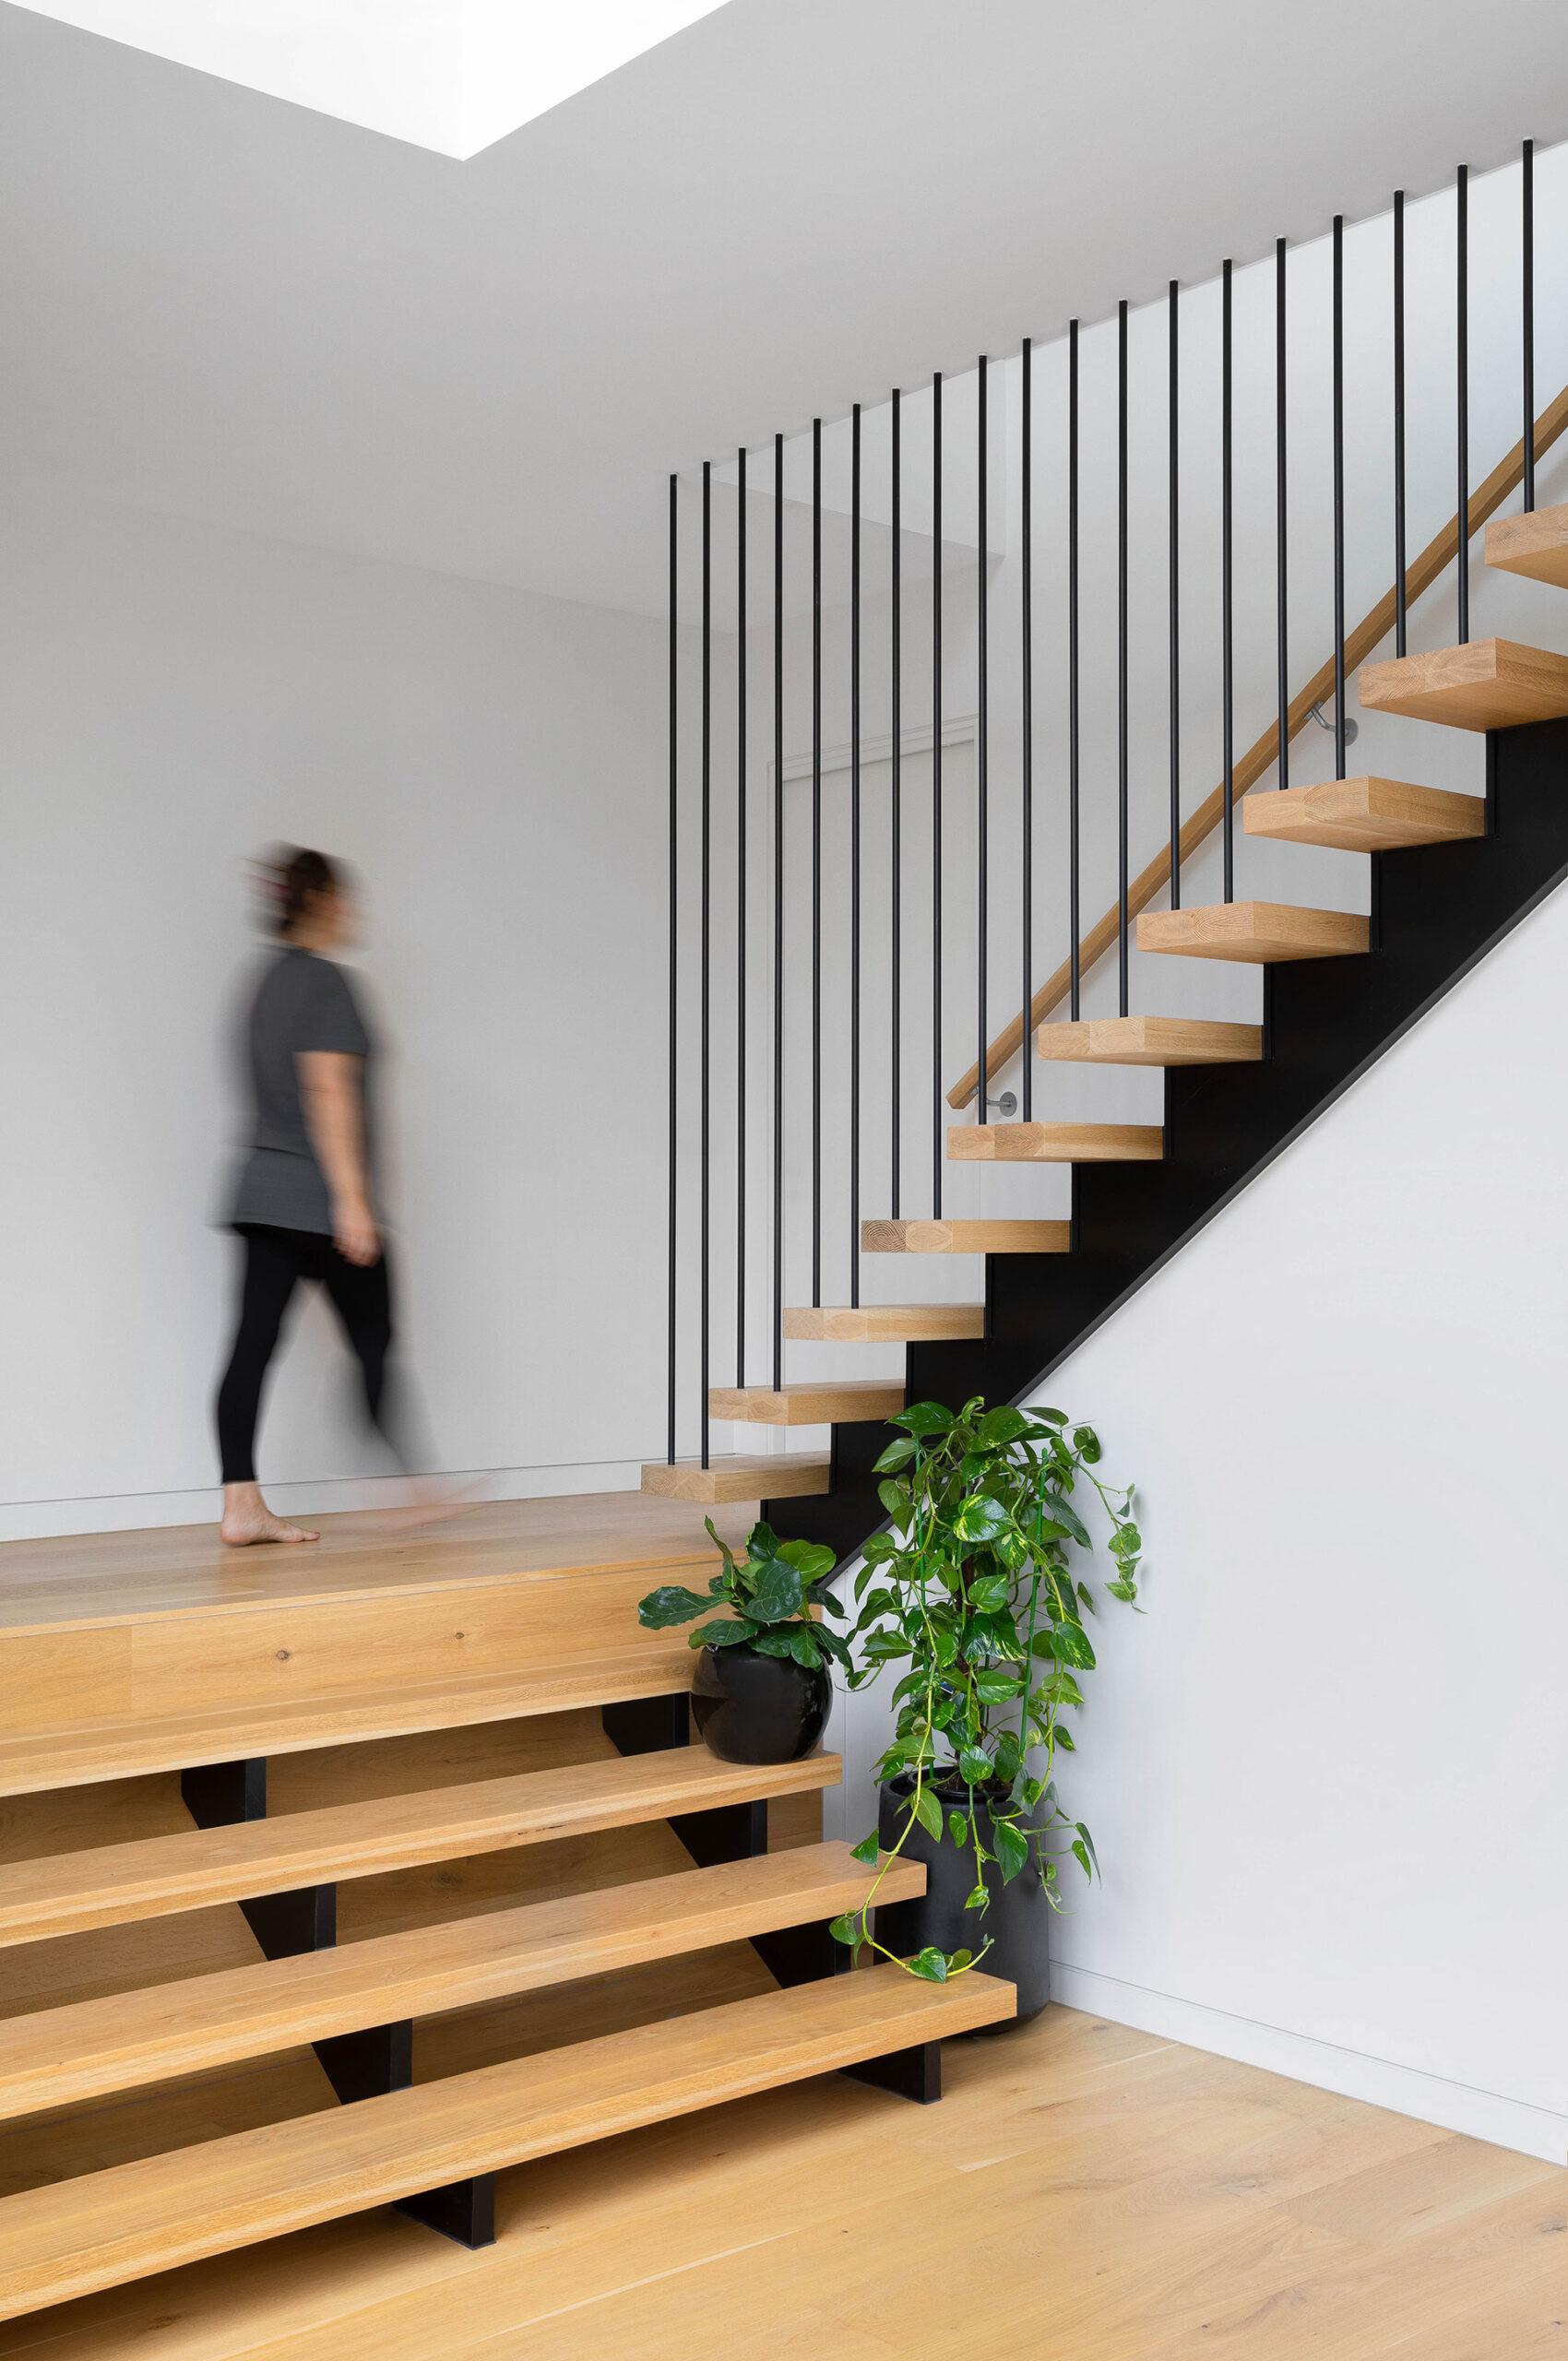 northcote-house-staircase-person-walking-ckairouz-architects